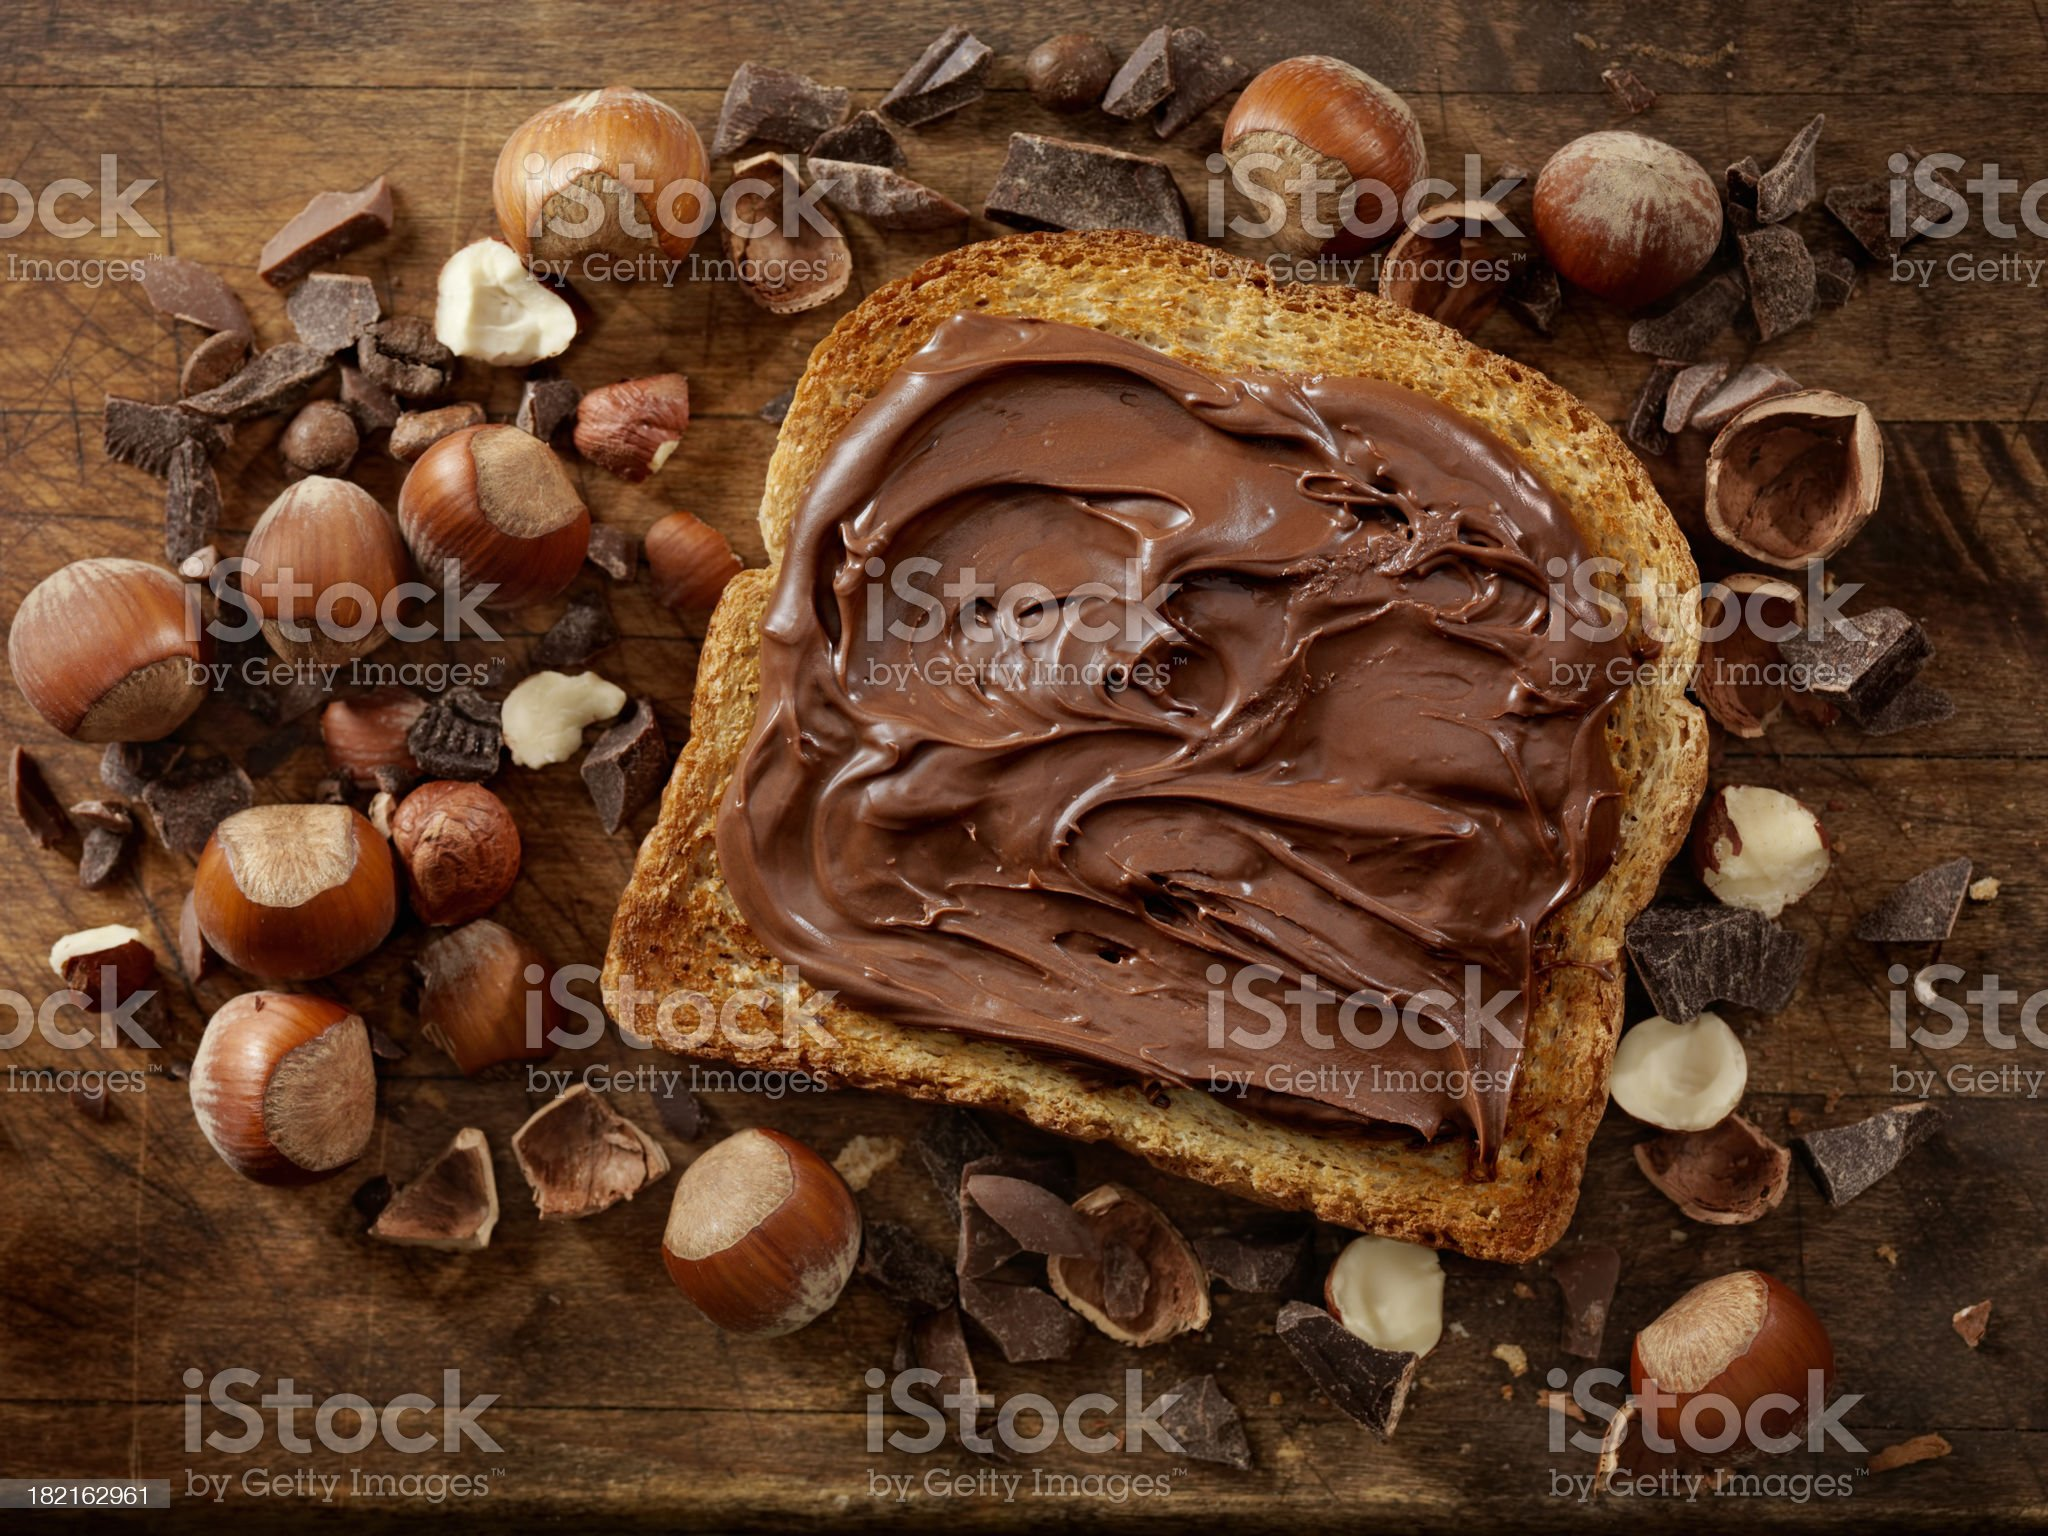 Chocolate Hazelnut Spread on Toast royalty-free stock photo